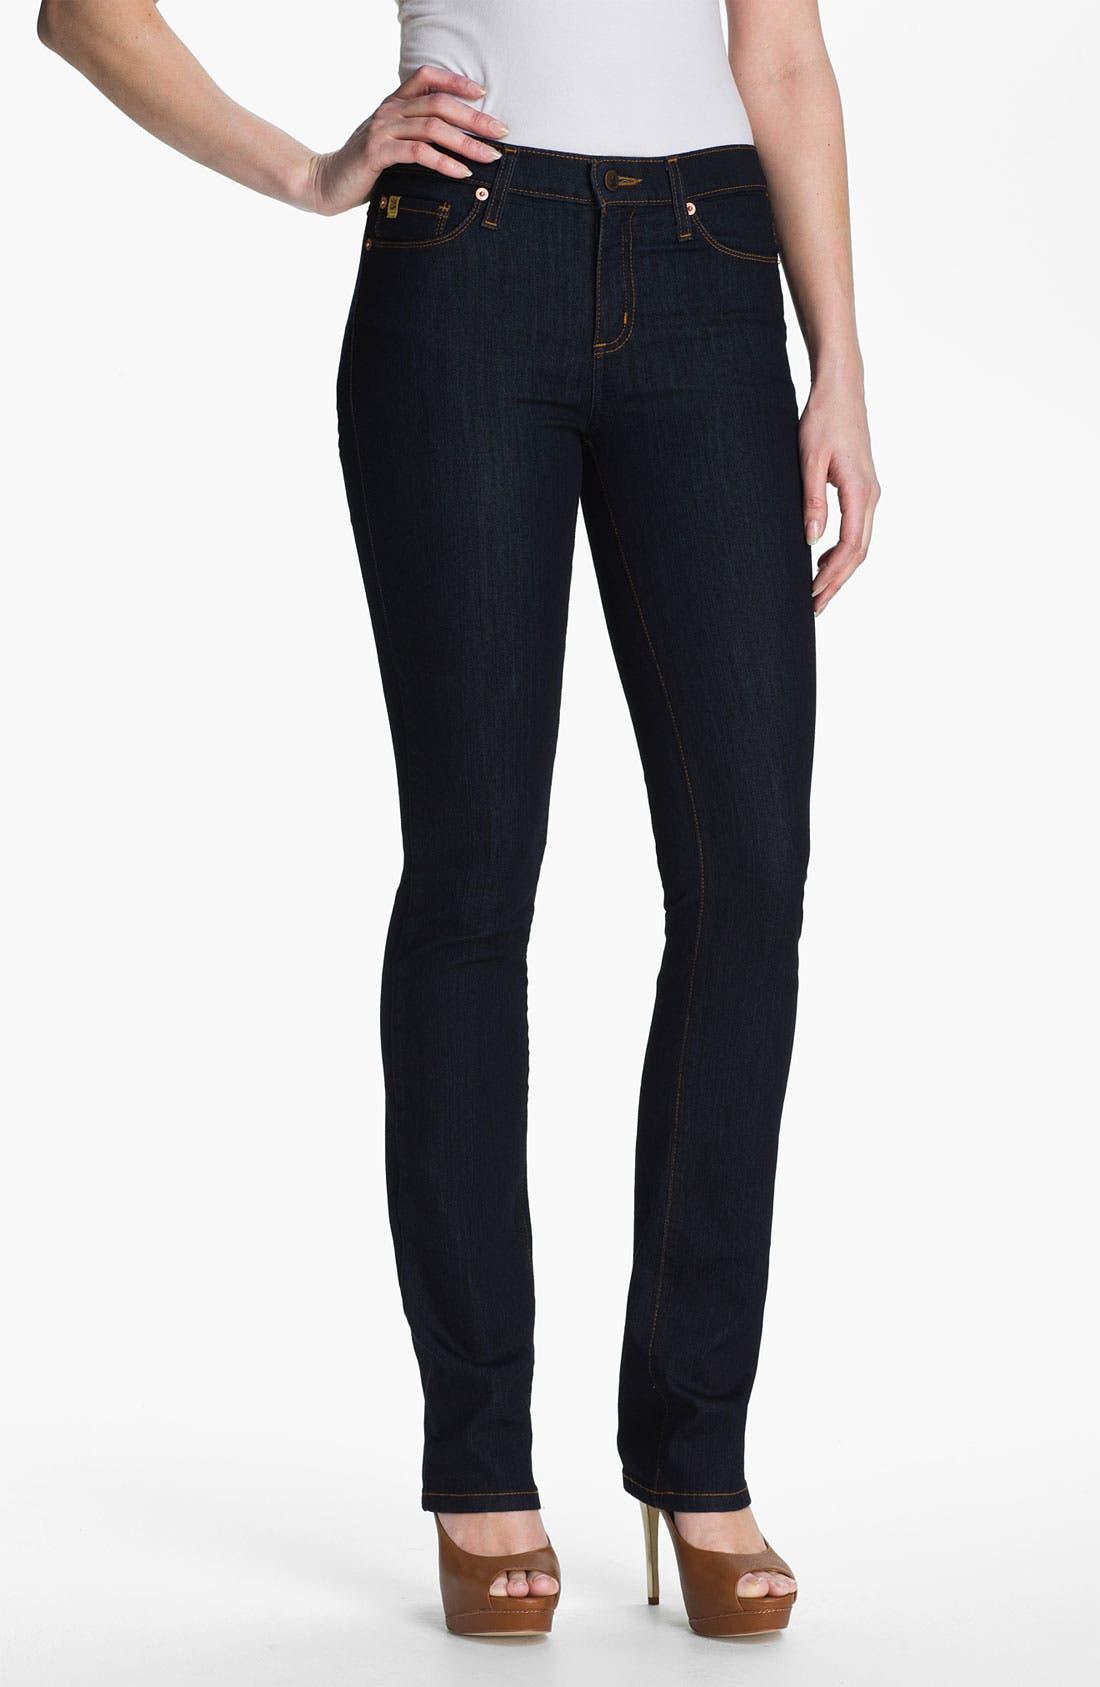 Main Image - Second Yoga Jeans Straight Leg Jeans